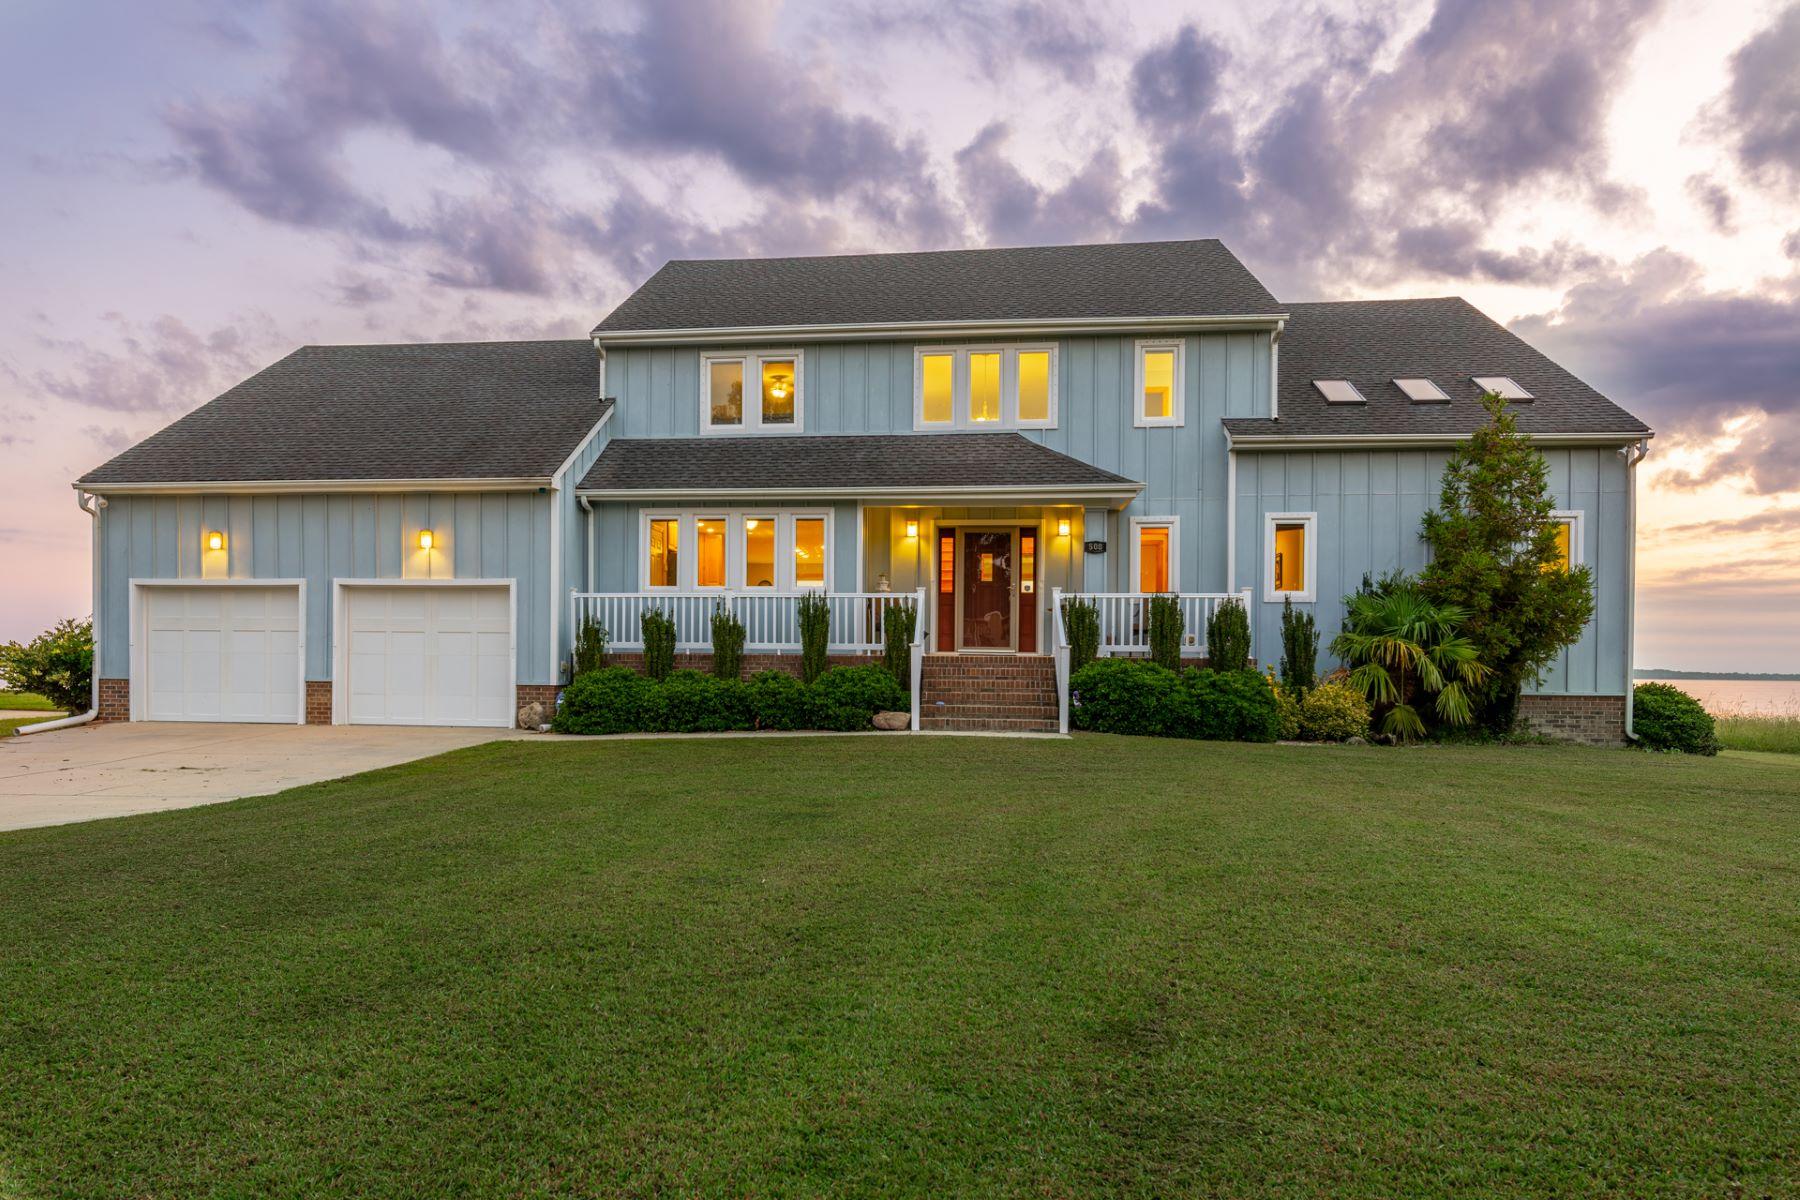 Single Family Homes for Active at Newbegun Land 508 Small Drive Elizabeth City, North Carolina 27909 United States